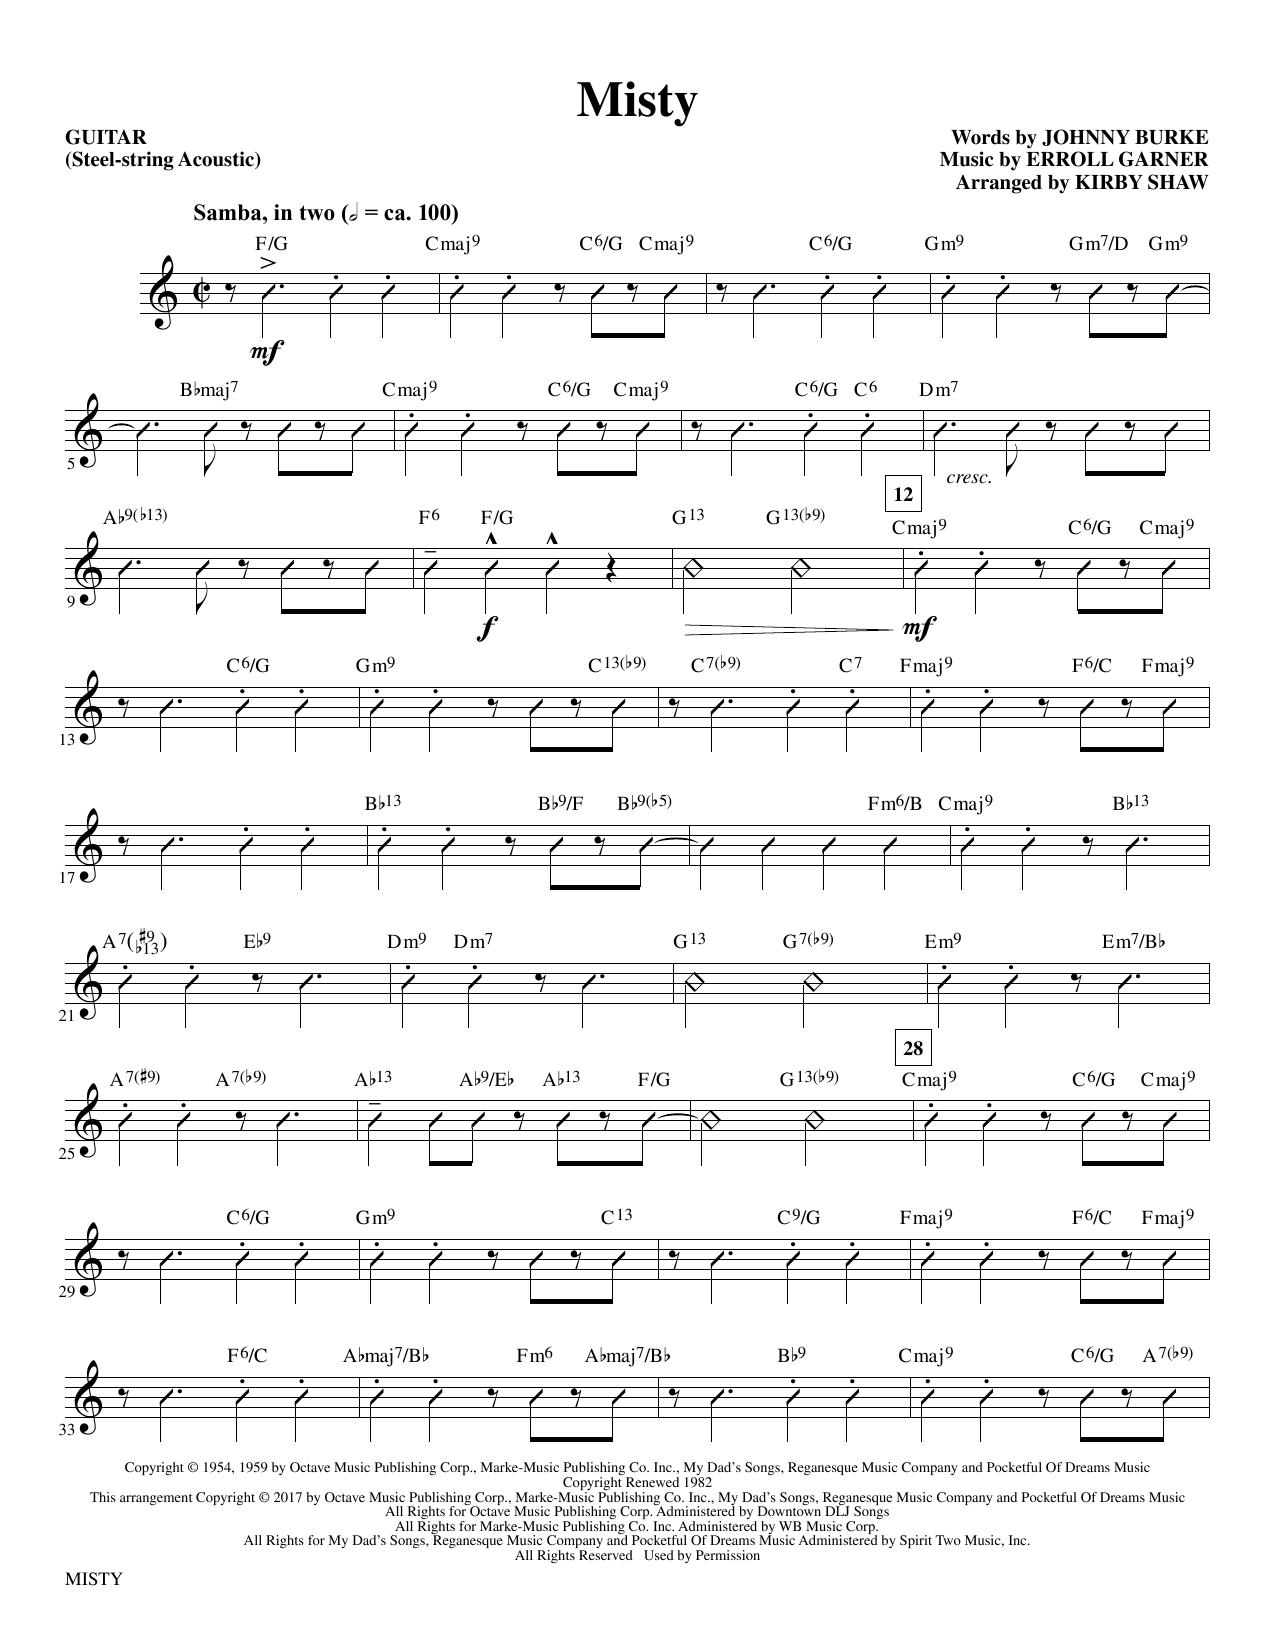 Misty - Guitar Partituras Digitales